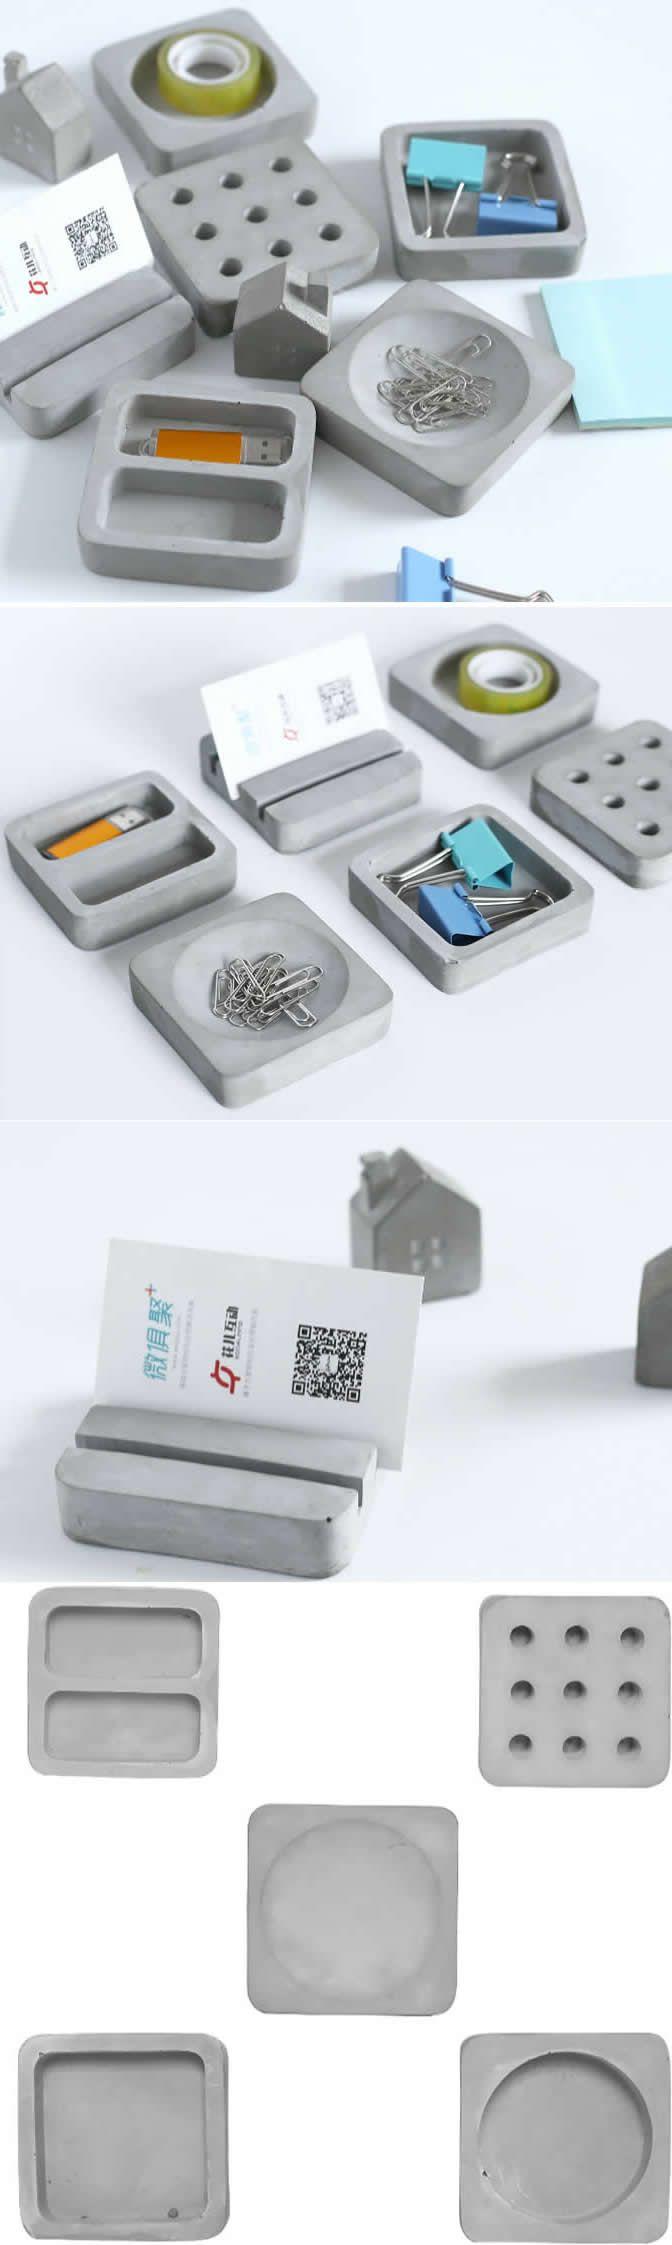 Concrete Modular Desk Stationery Organizer Smart Phone Dock Stand ...